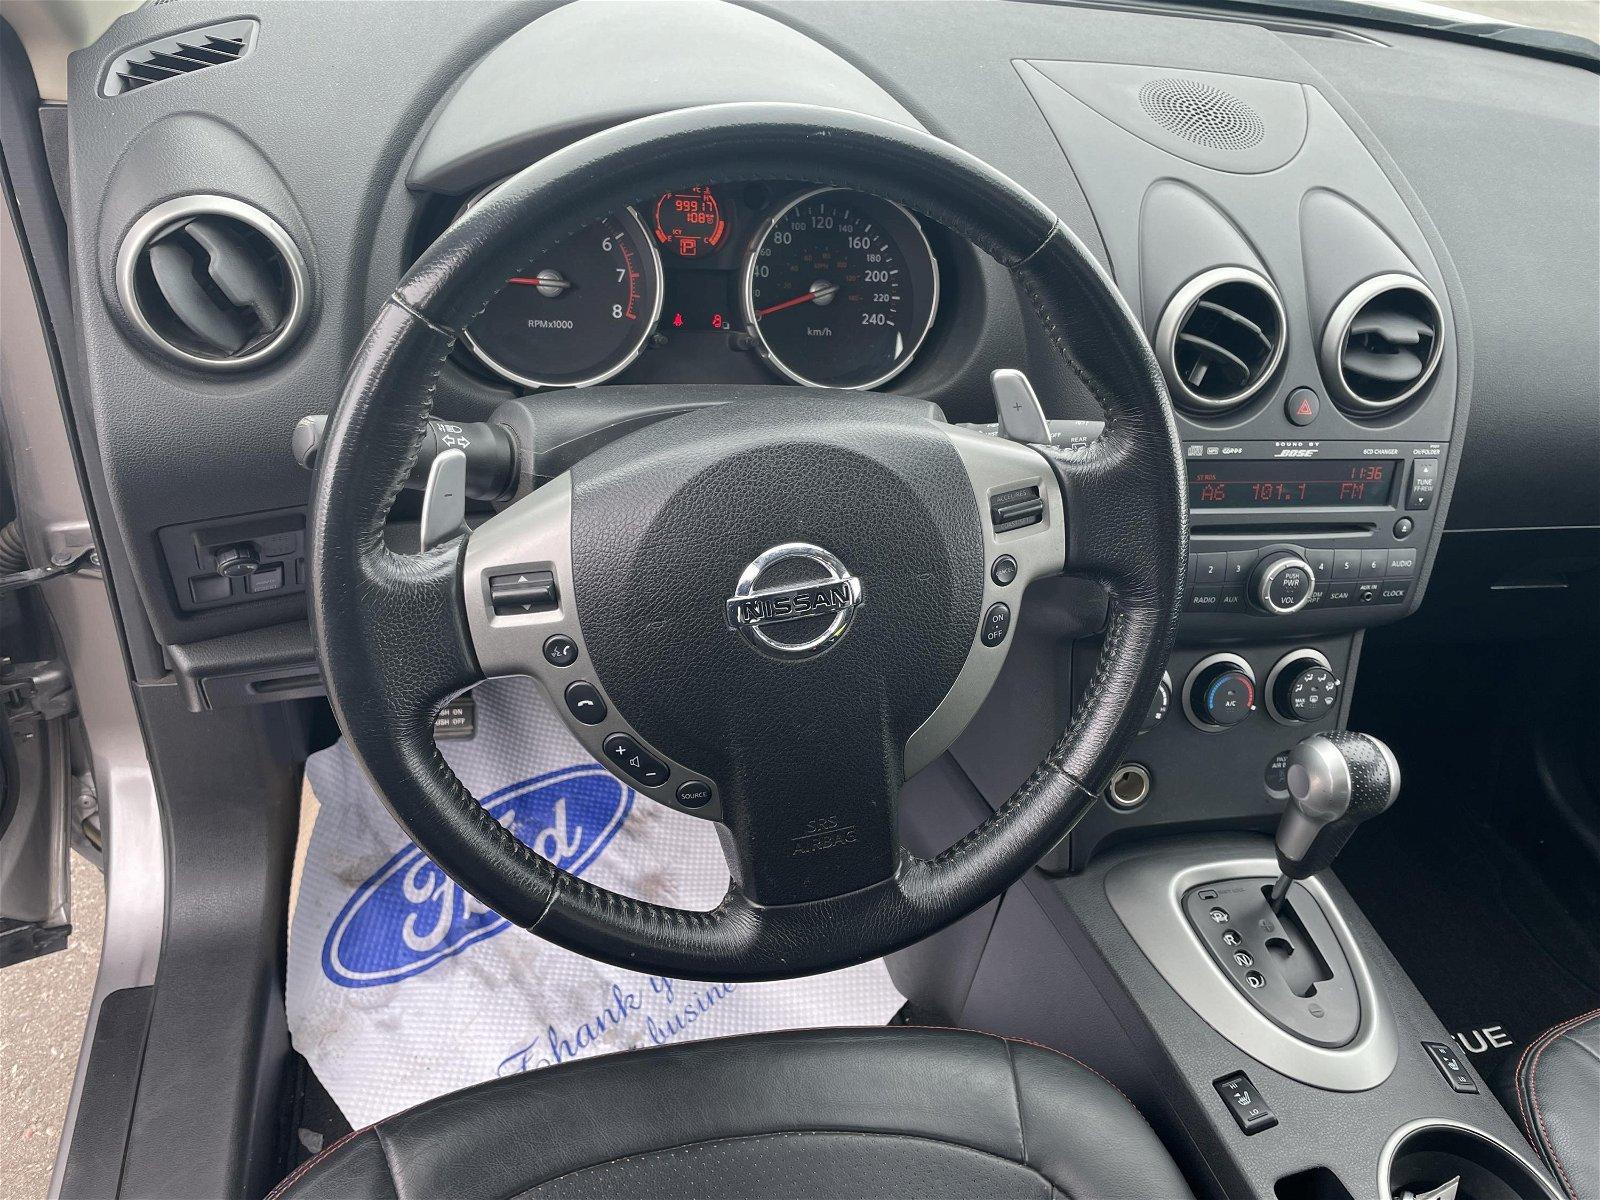 2010 Nissan Rogue SL AWD Leather